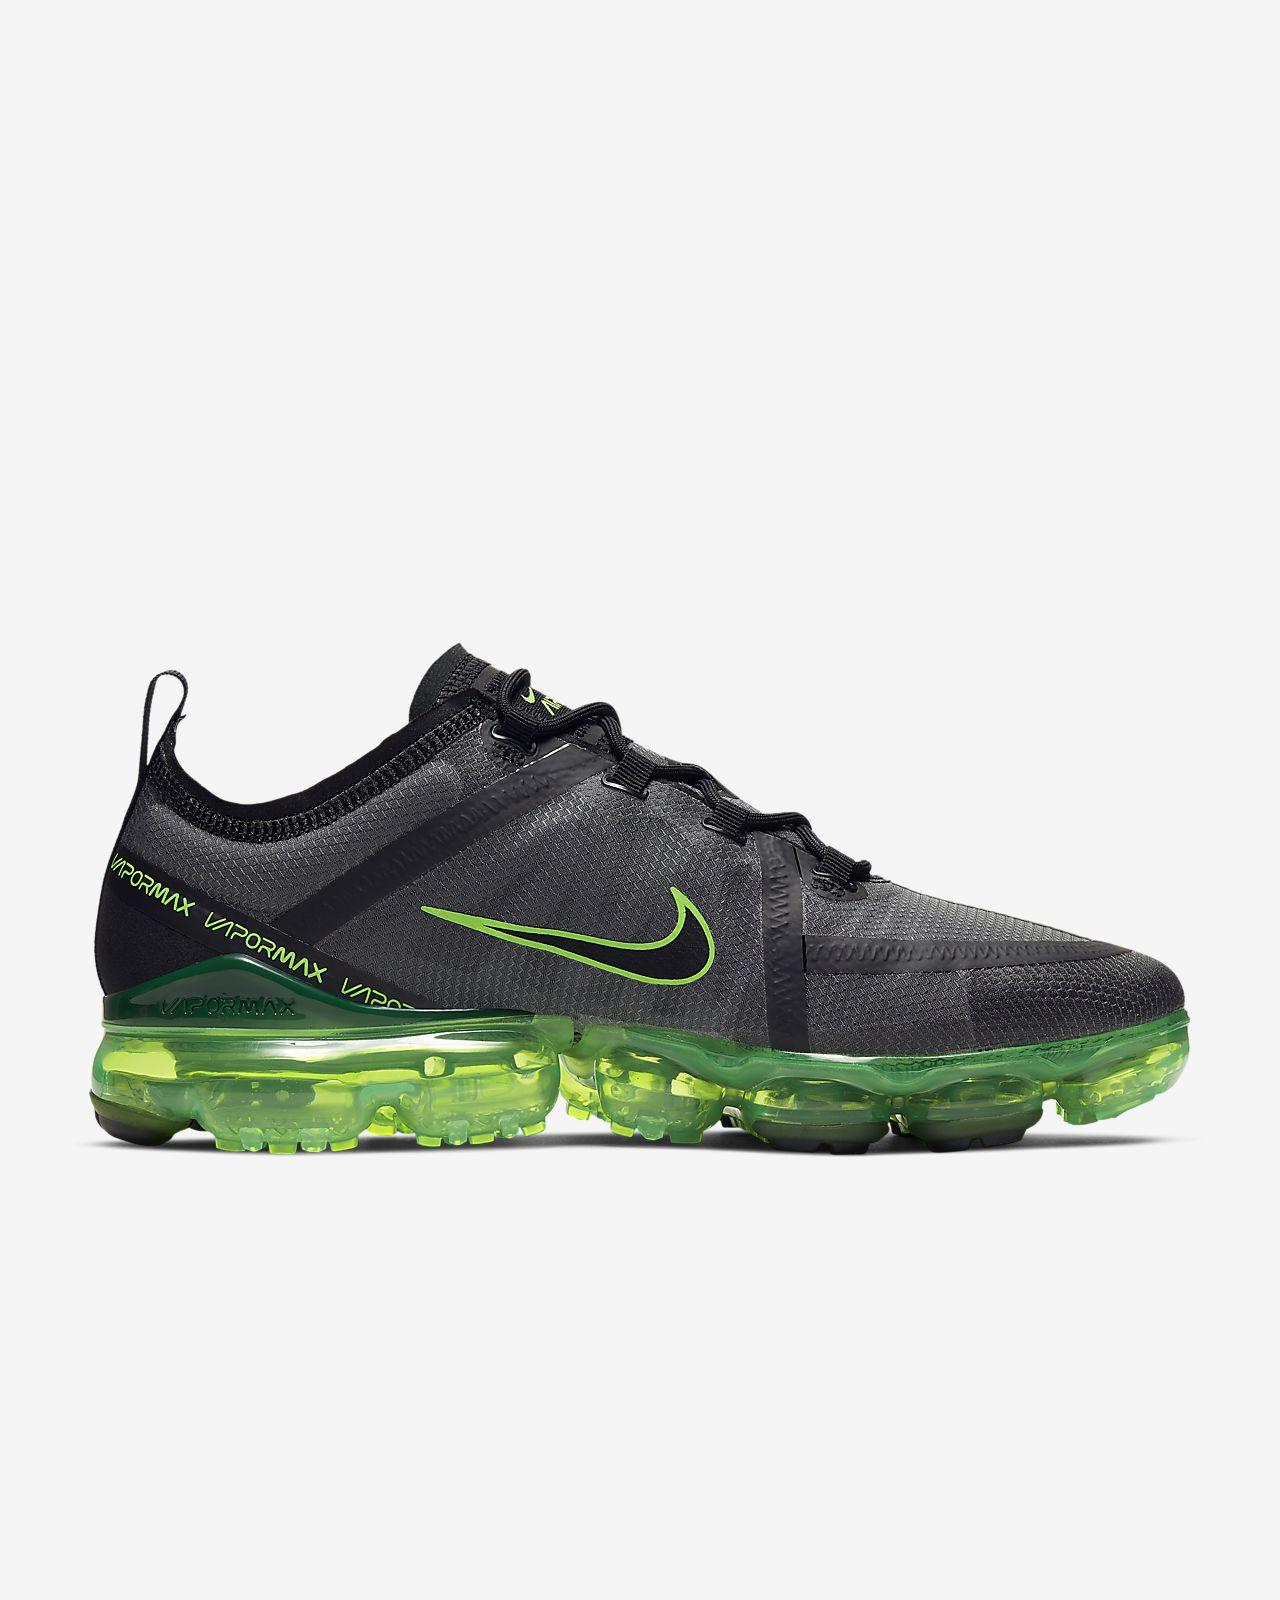 Calzado Nike Air VaporMax 2019